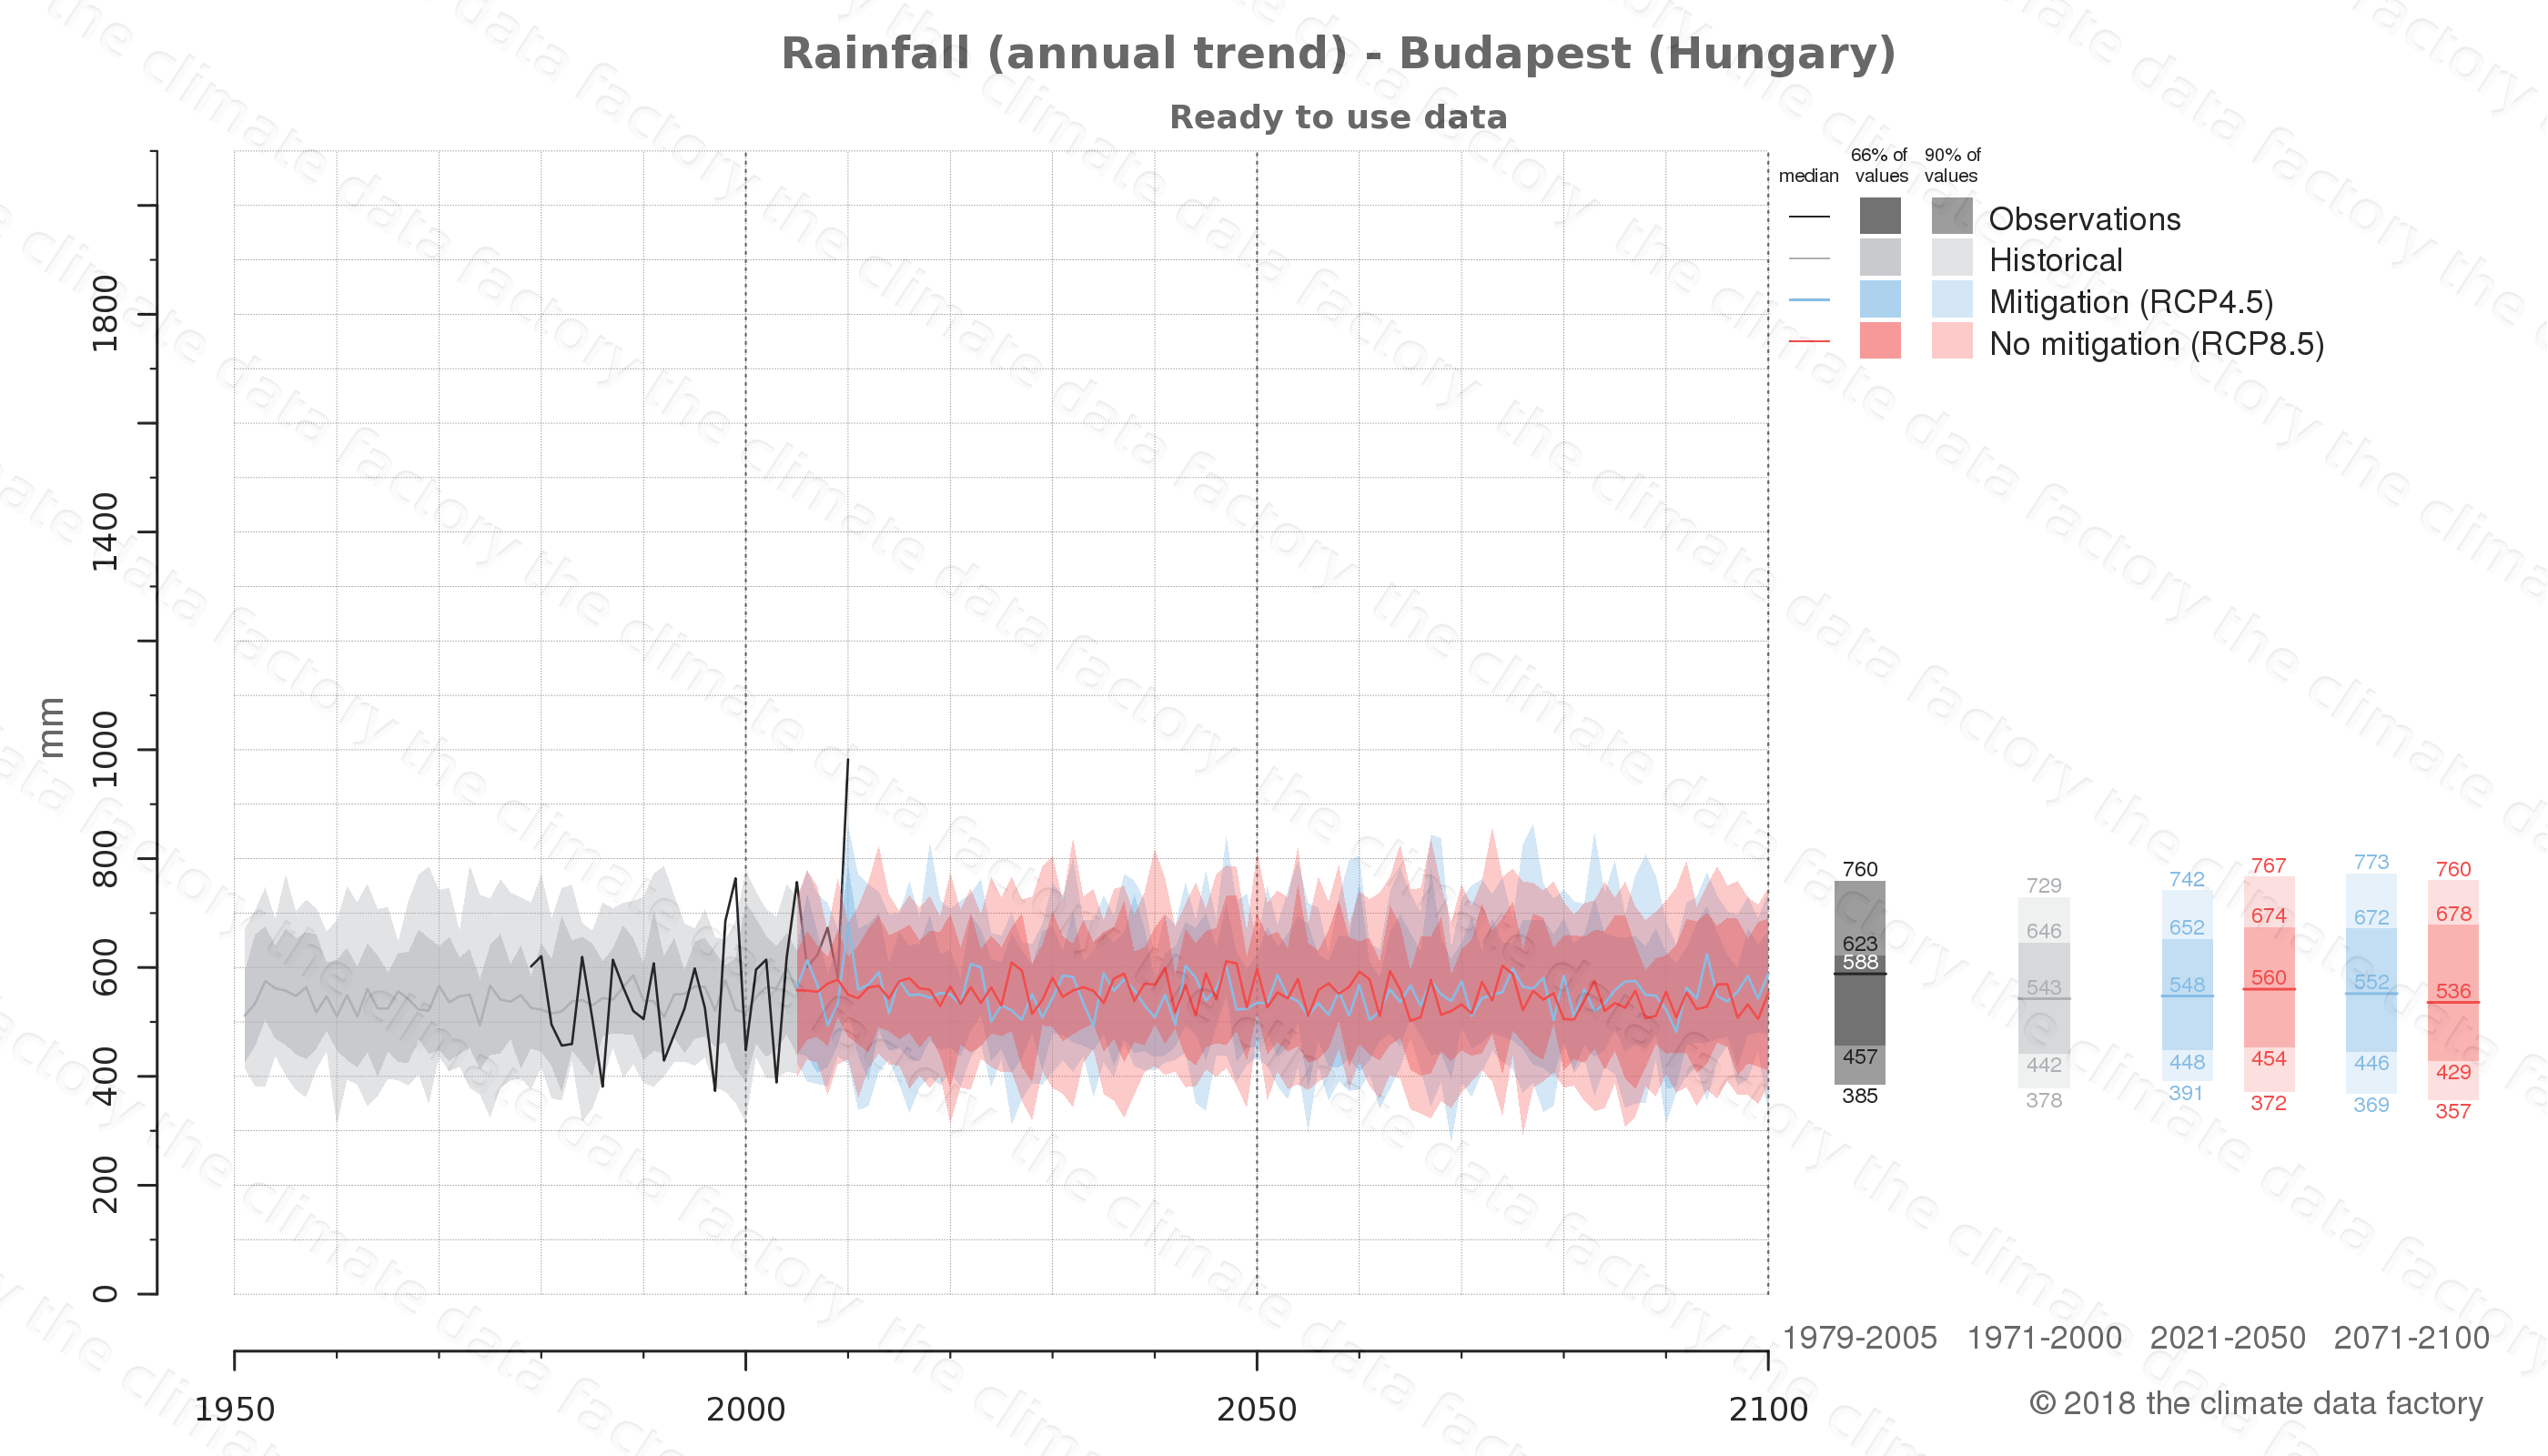 climate change data policy adaptation climate graph city data rainfall budapest hungary